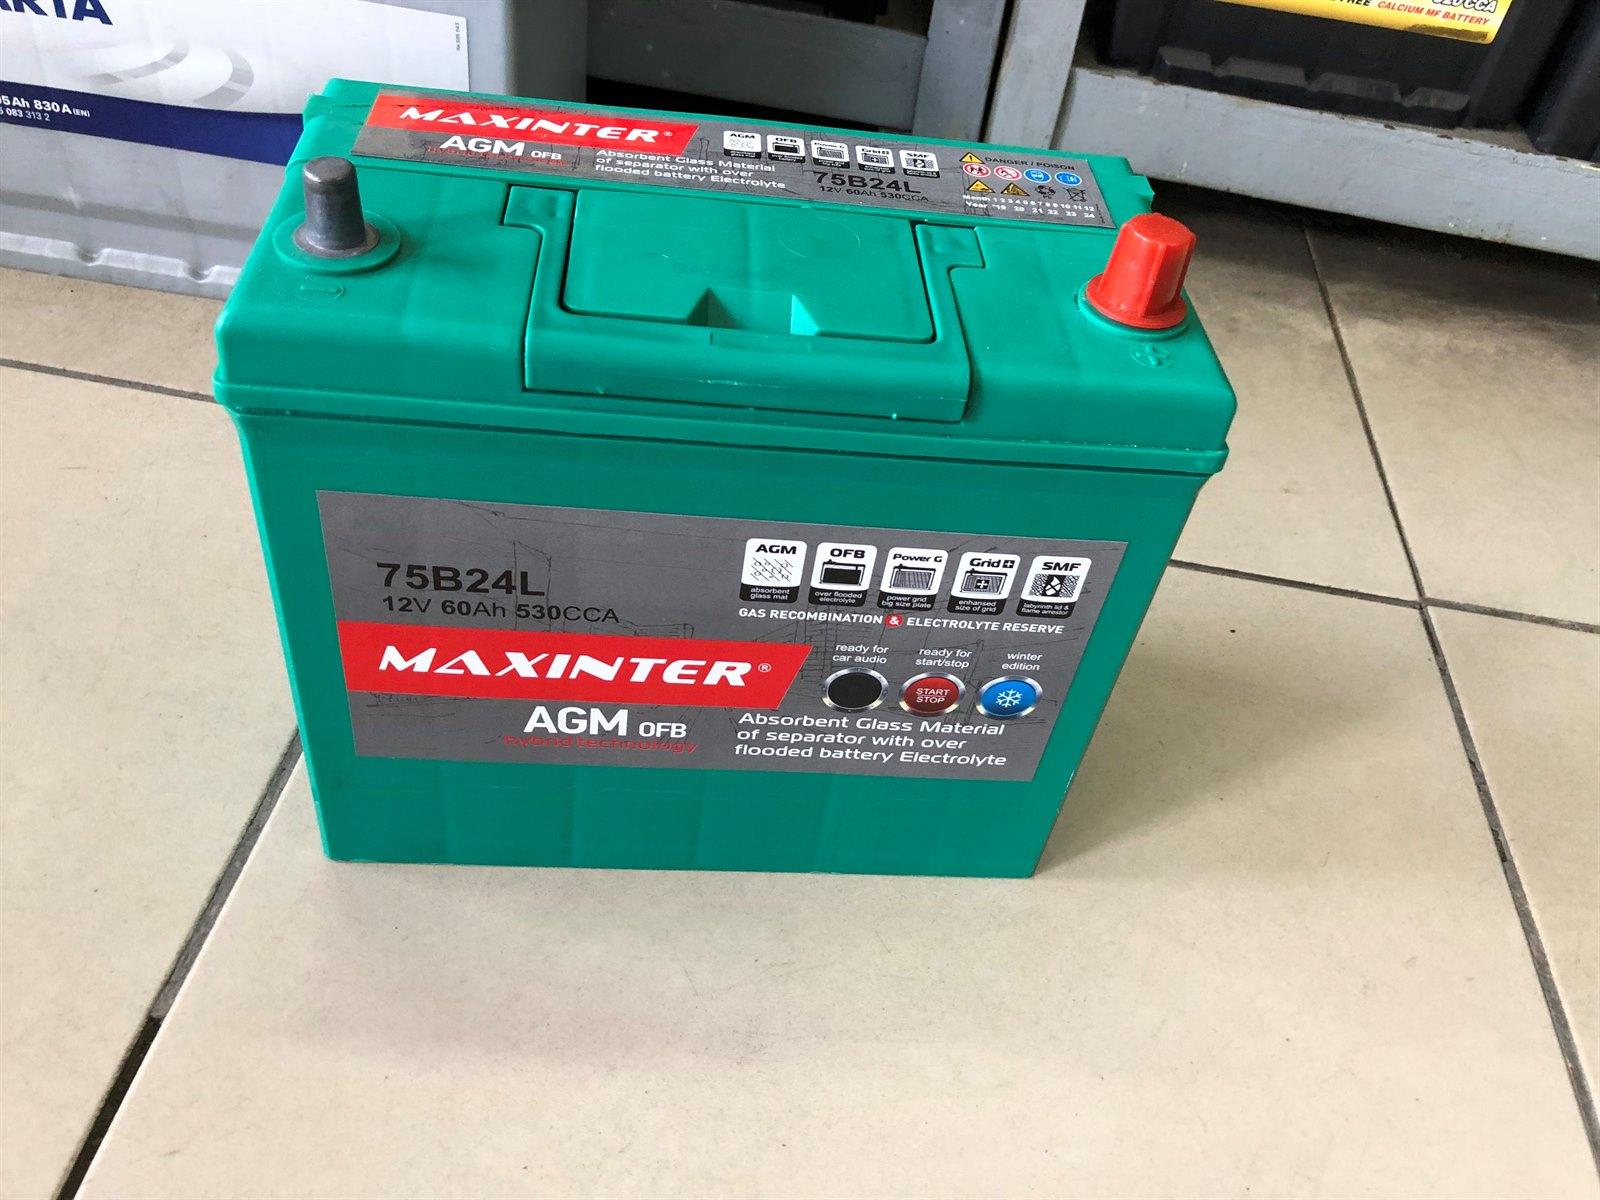 Аккумулятор Maxinter AGM OFB 75B24L